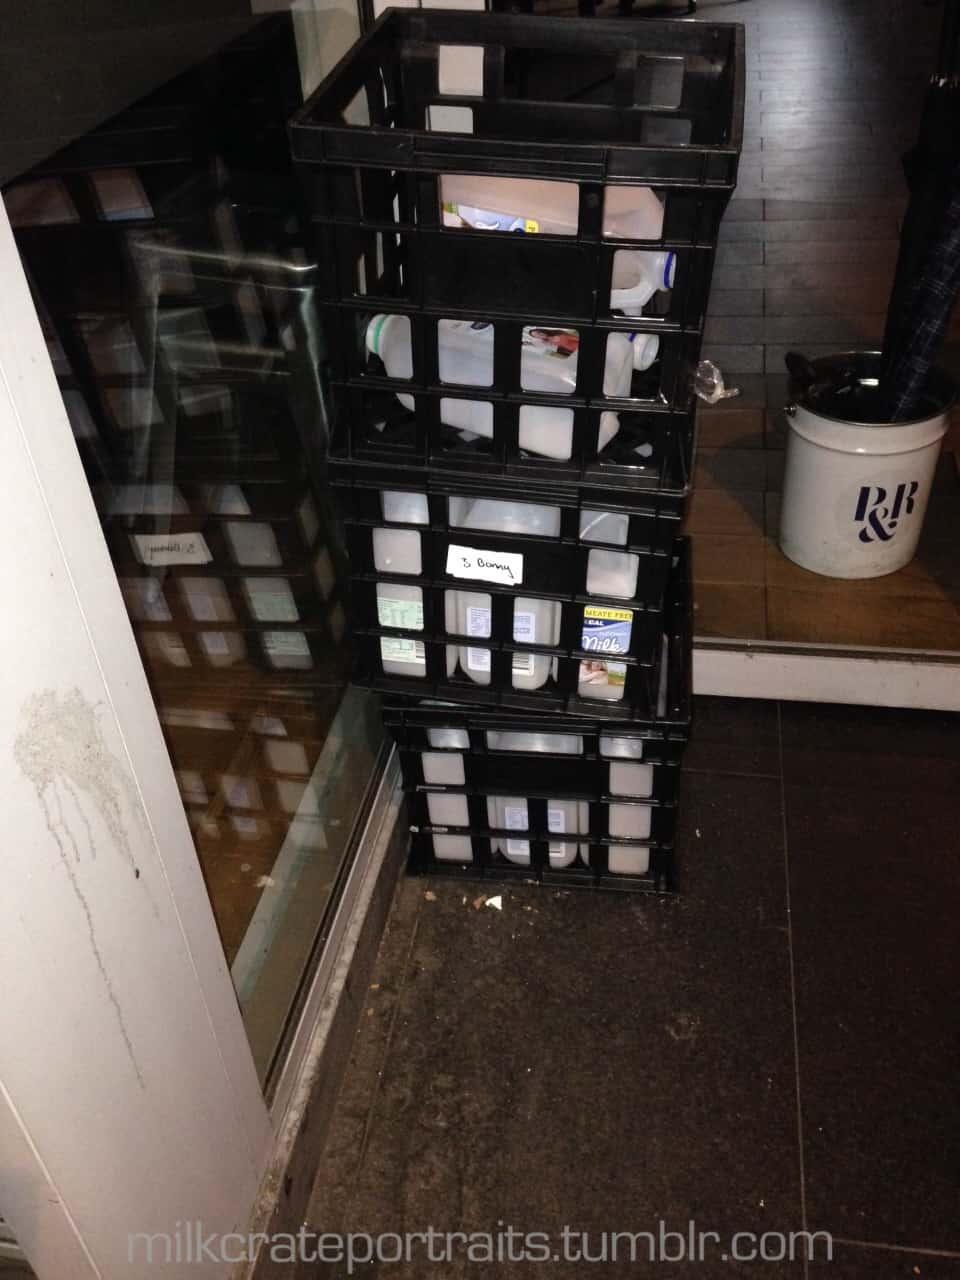 Milk crates with empty milk bottles in them.